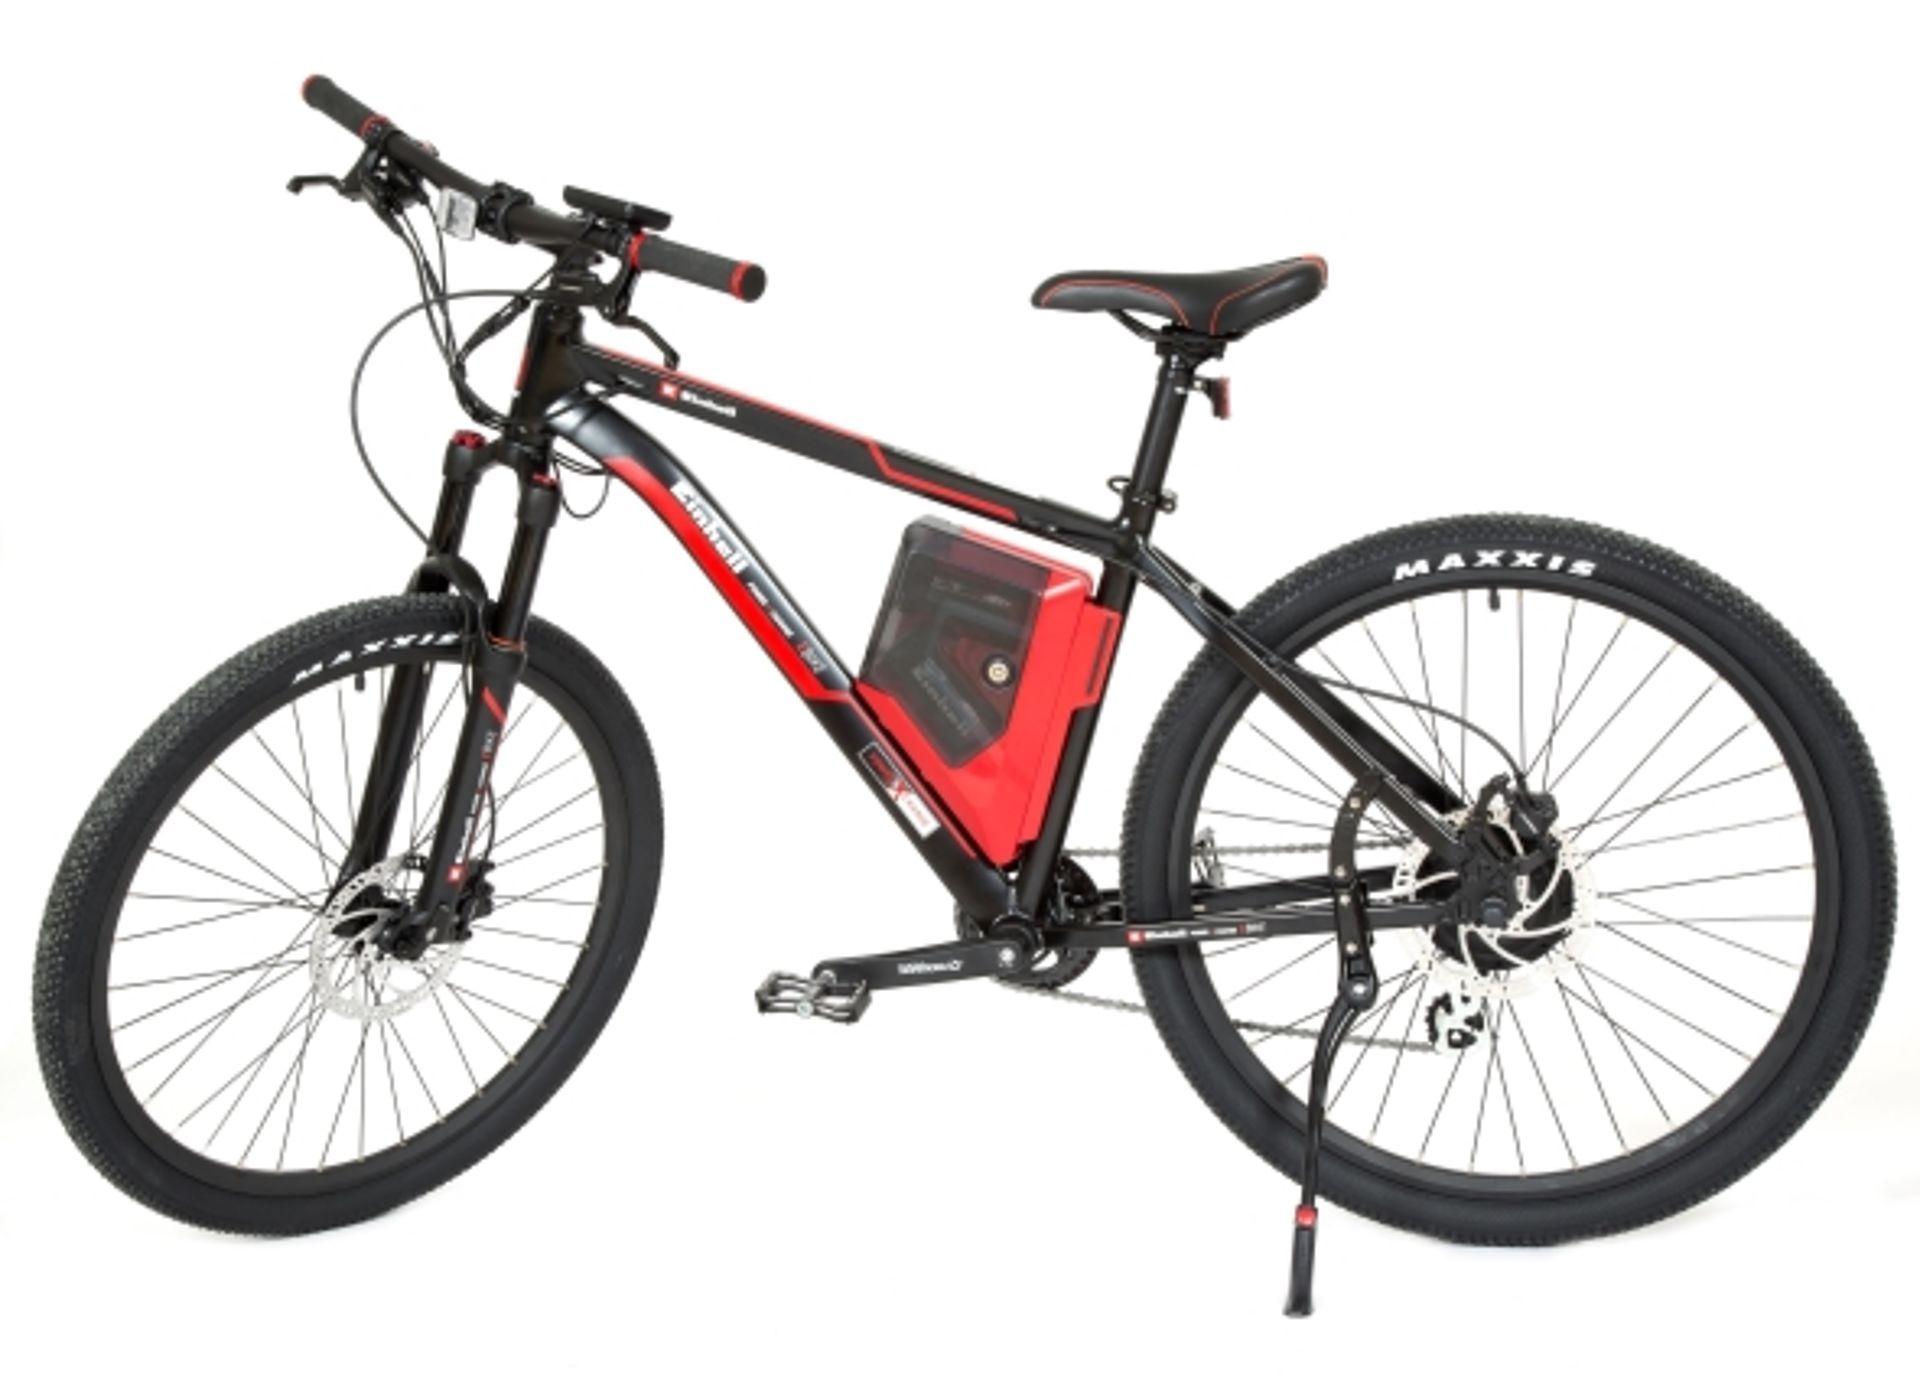 Einhell Power X-Change E-bike